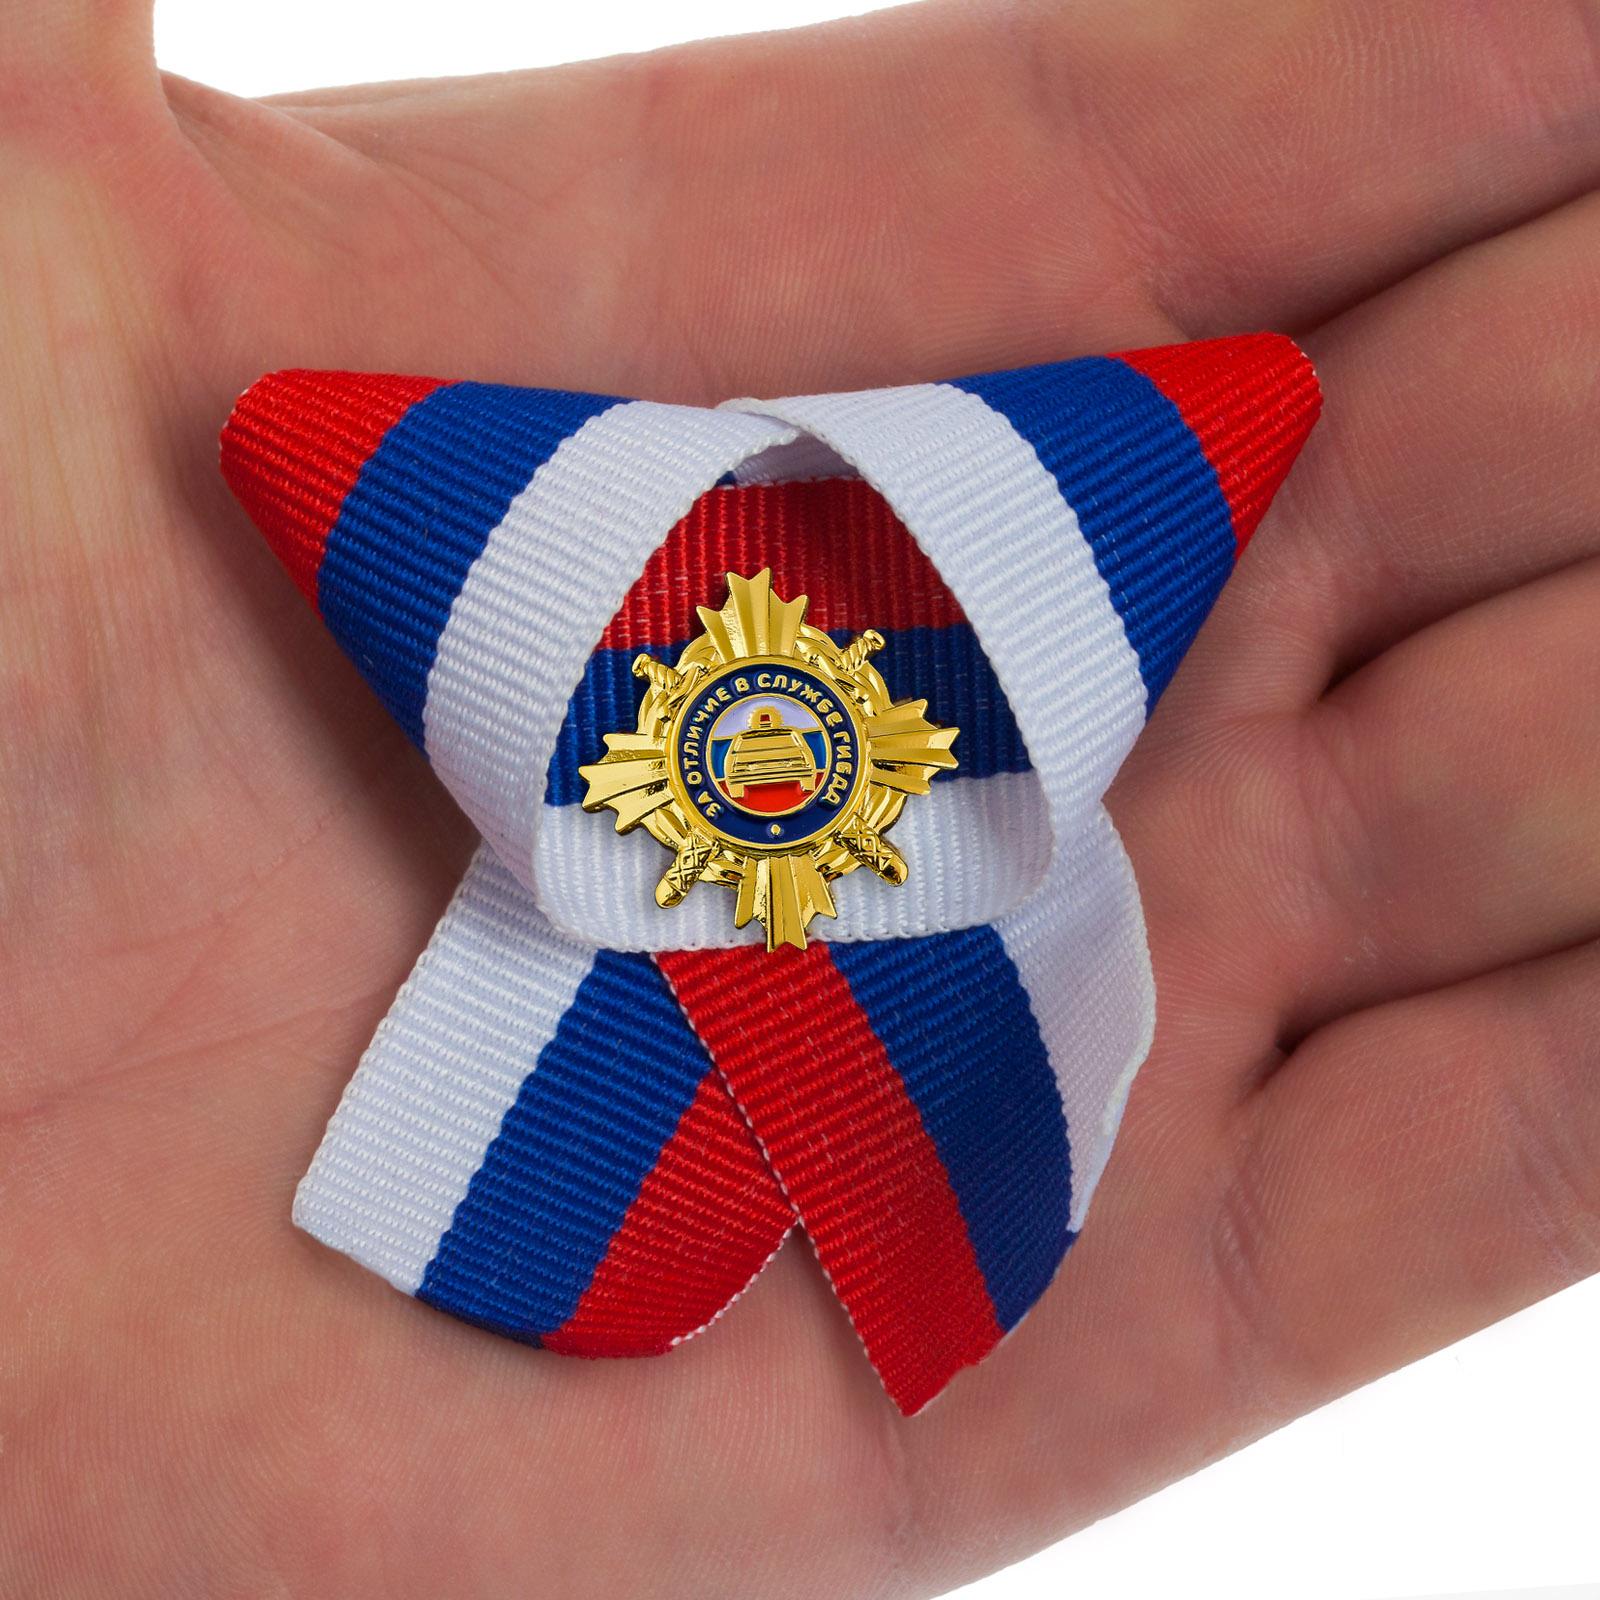 Значки ГИБДД, МВД заказать онлайн по низкой цене